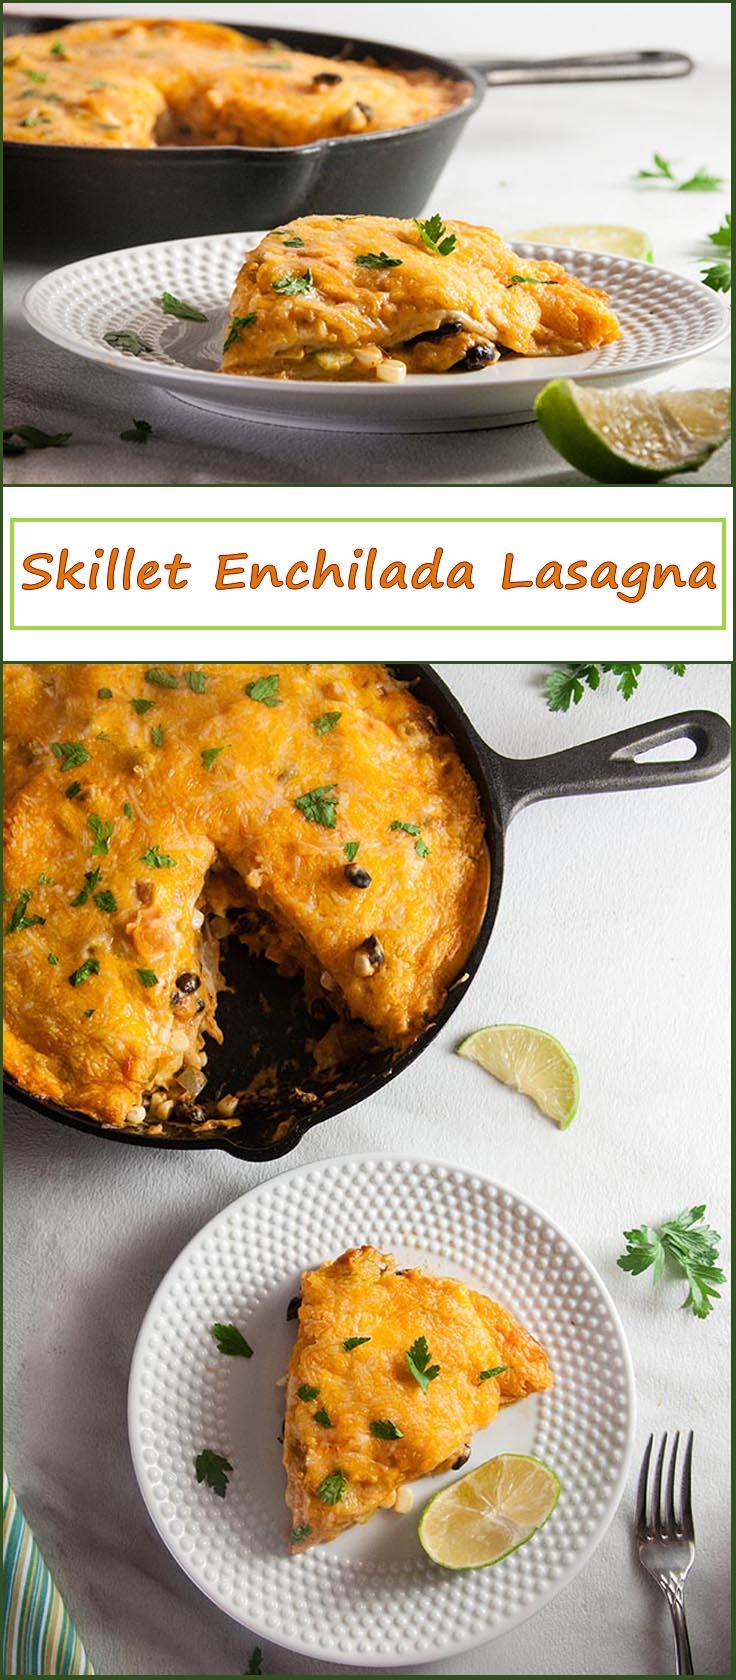 Shortcut Skillet Enchilada Lasagna from www.SeasonedSprinkles.com